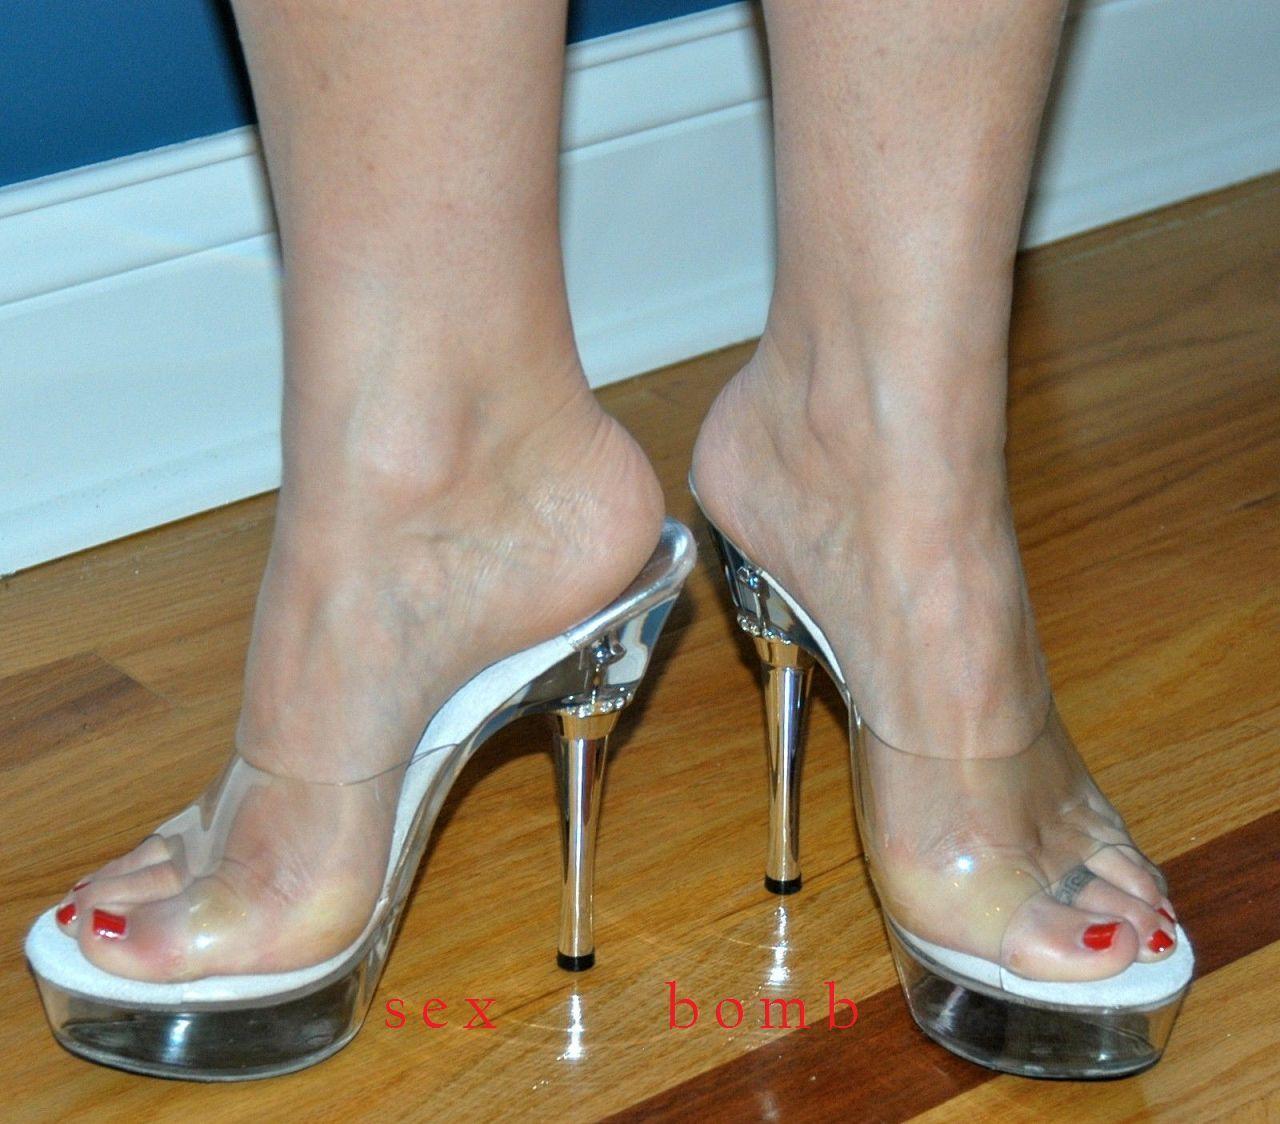 SEXY sabot sandali plateau strass trasparenti tacco 14 DAL 35 AL 43 GLAMOUR